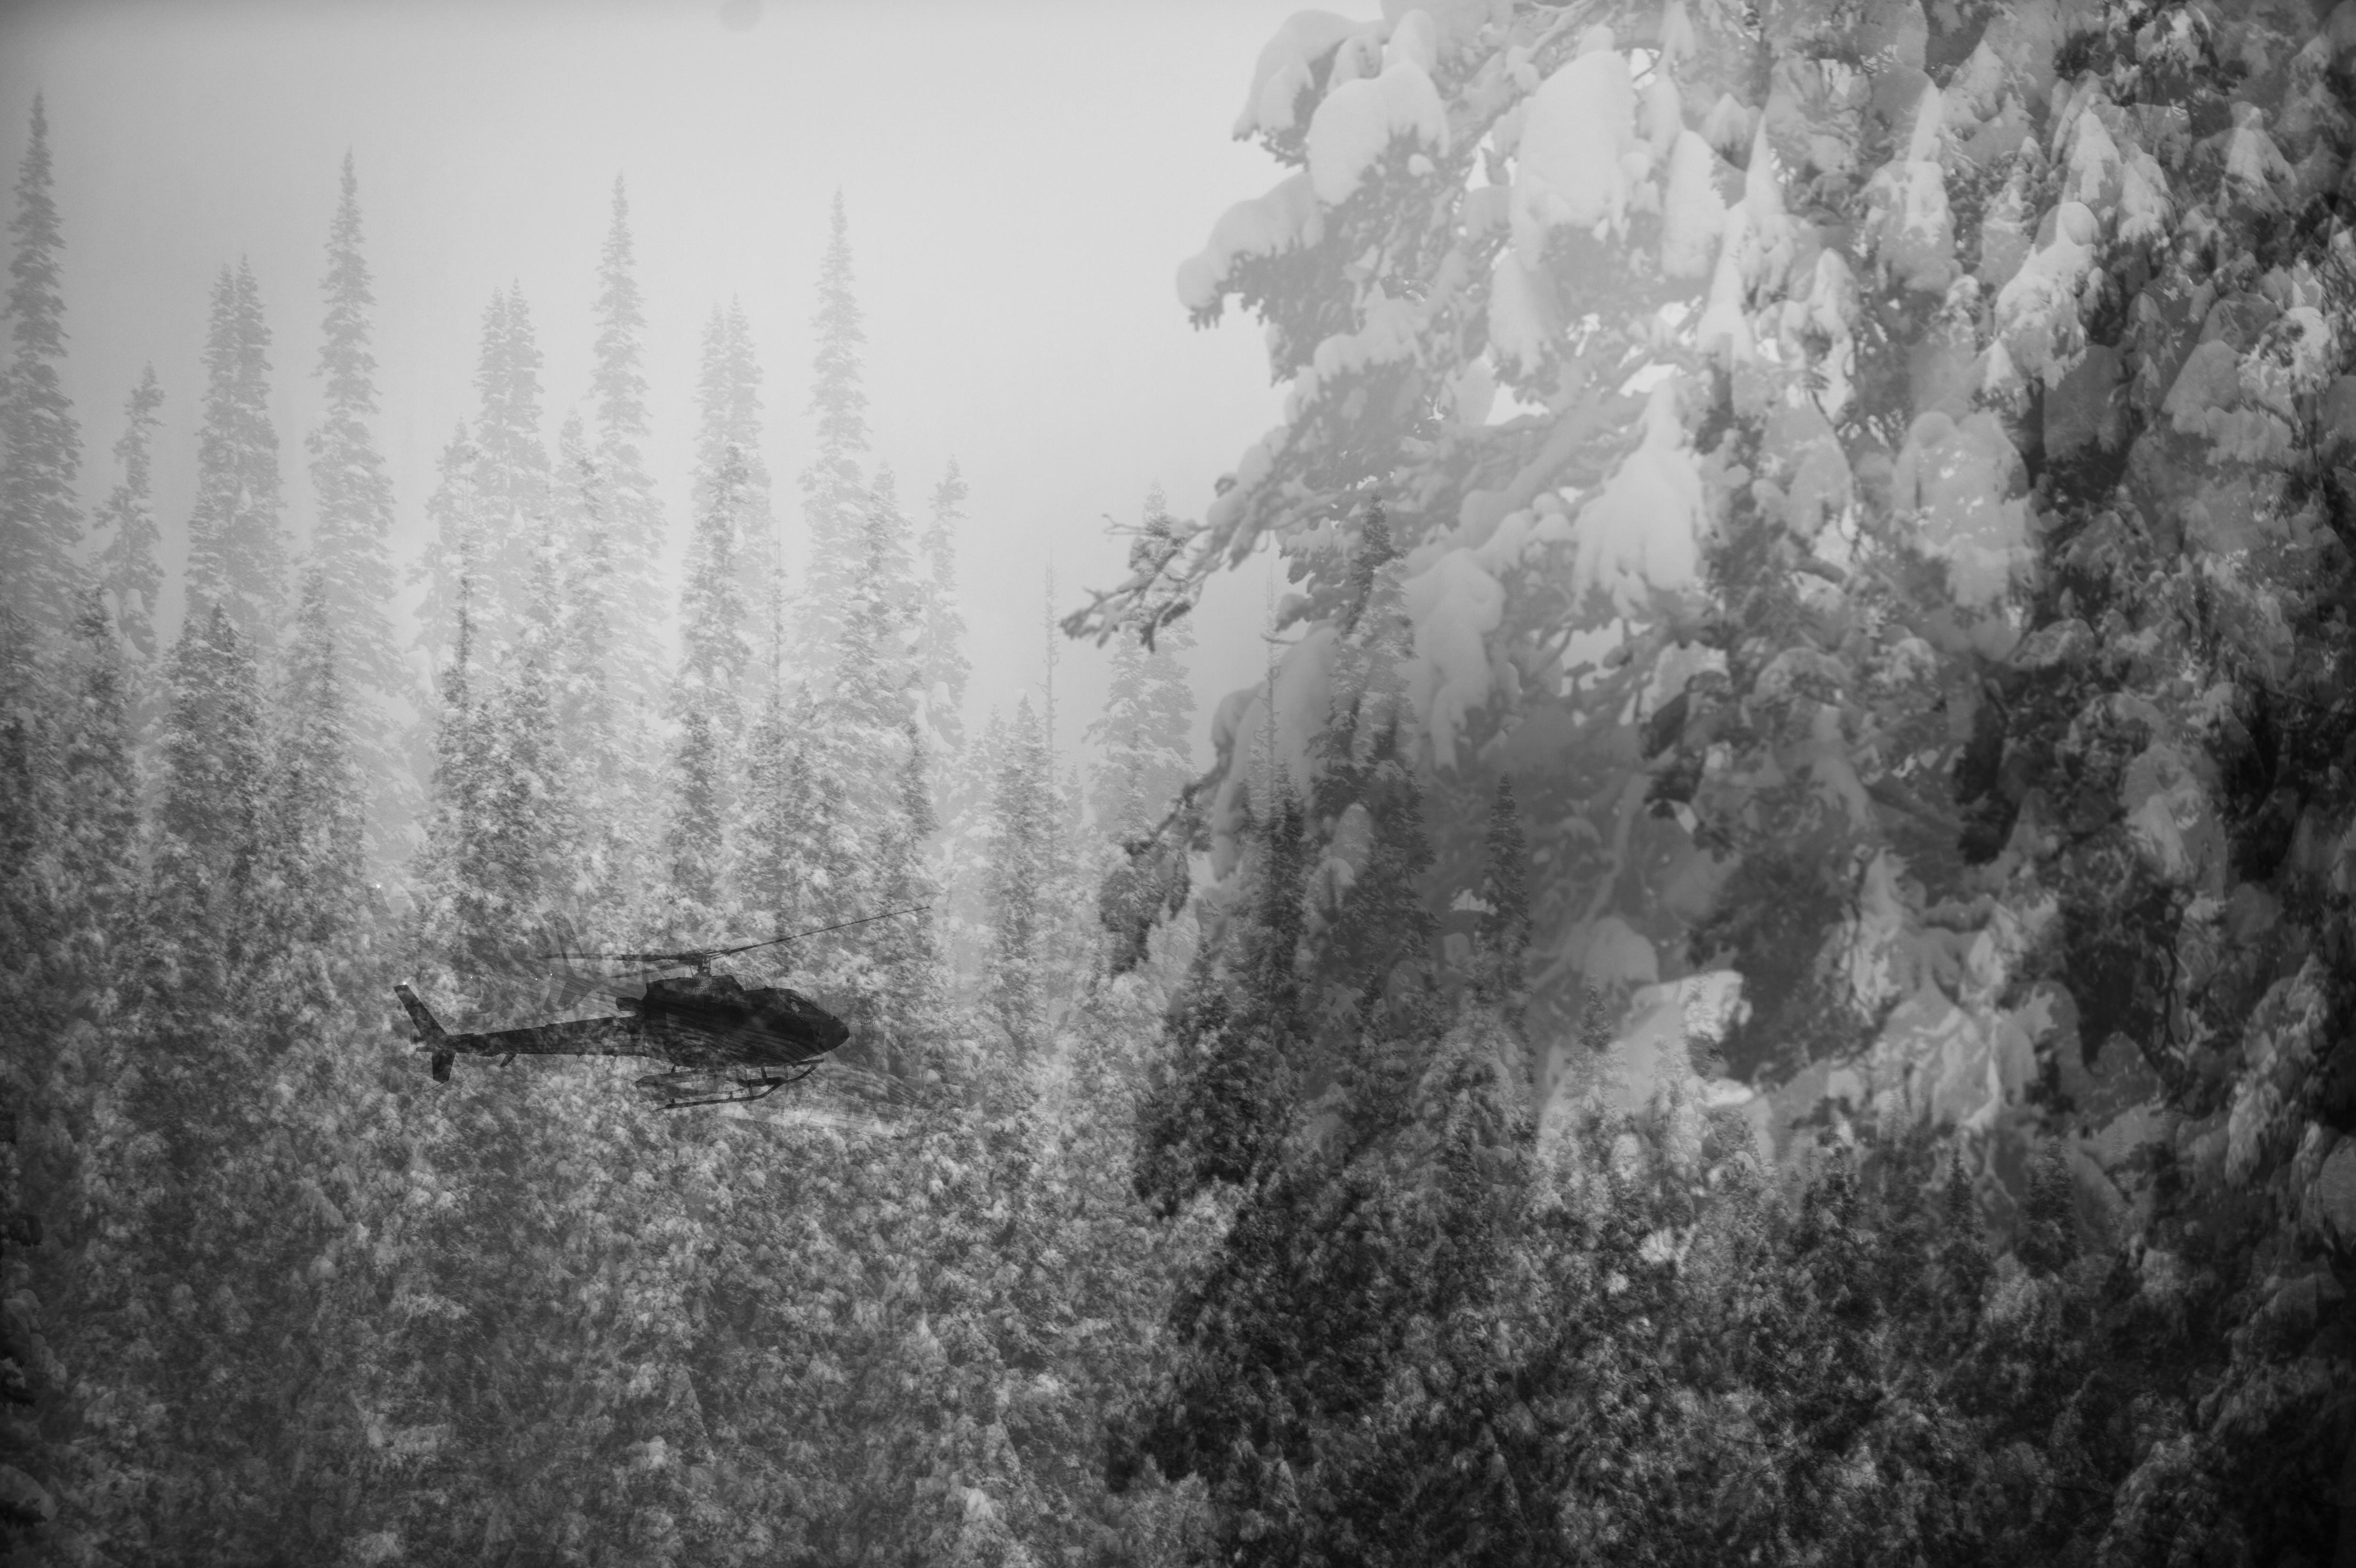 Heli skiing photo by Reuben Krabbe